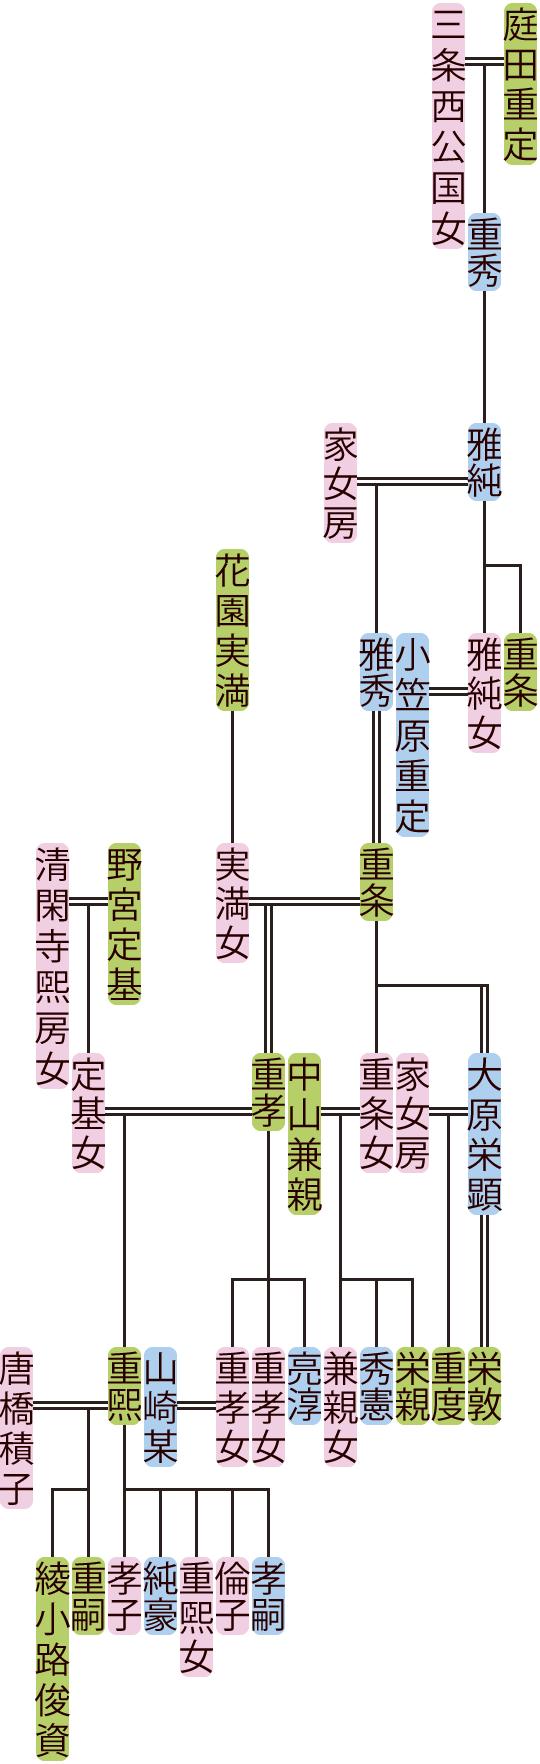 庭田雅純~重孝の系図